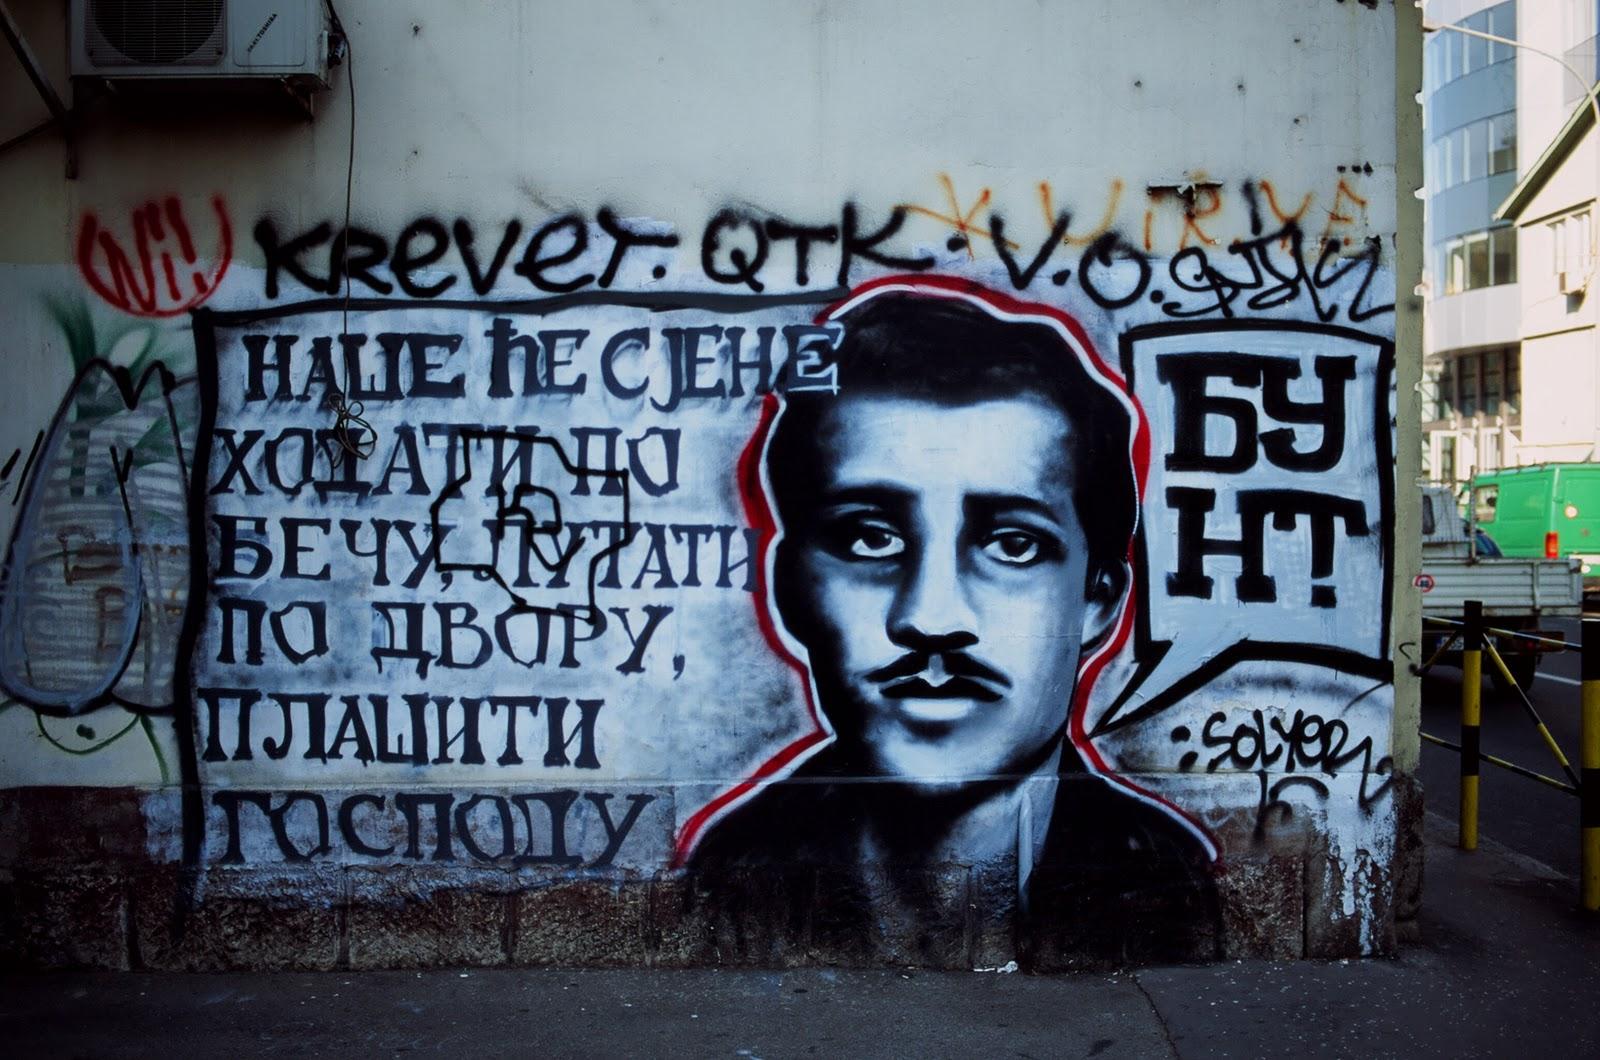 Graffiti in belgrade